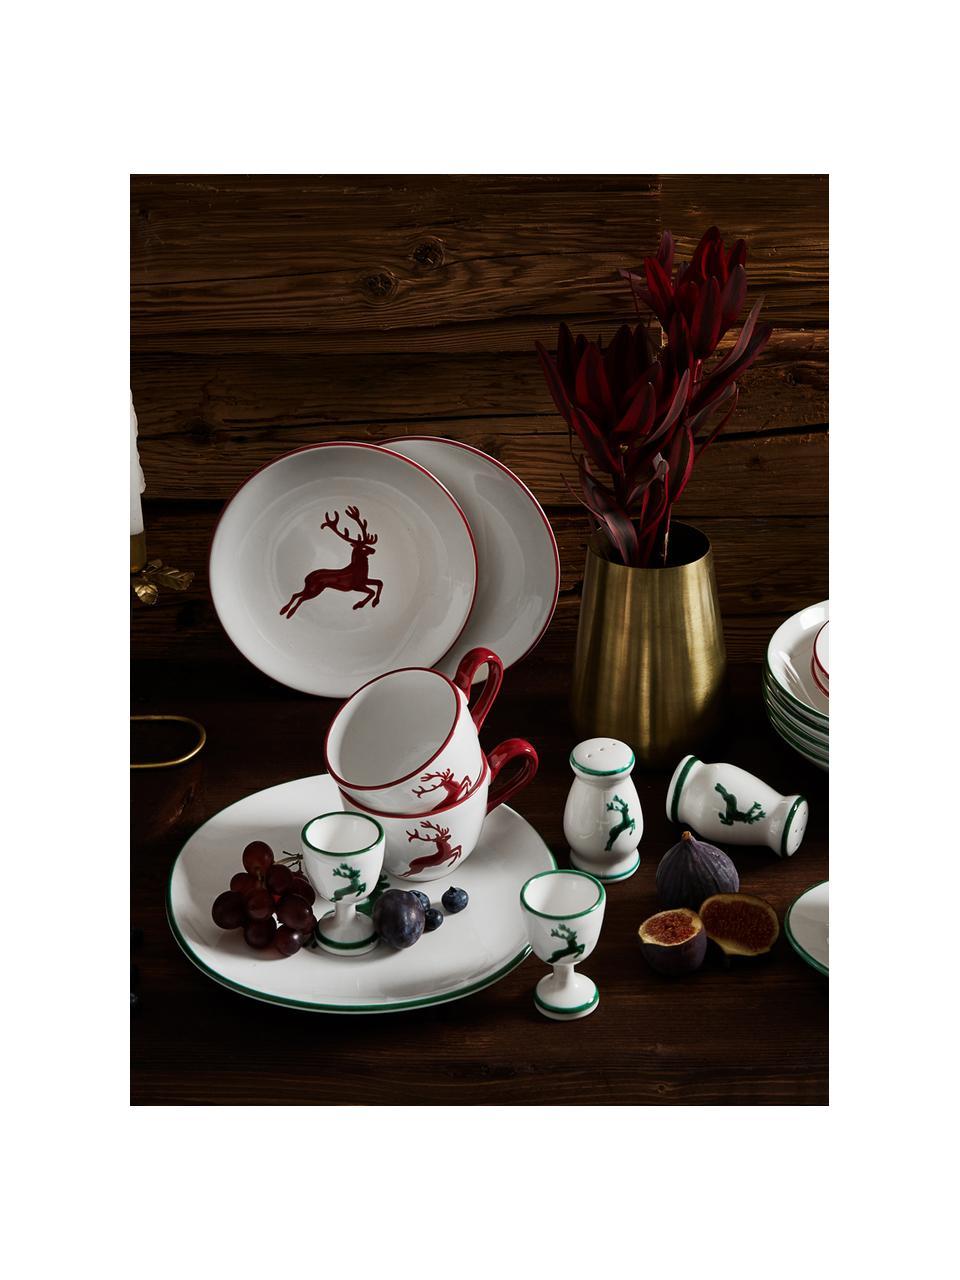 Handbemaltes Kaffeeservice Classic Roter Hirsch, 2 Personen (6-tlg.), Keramik, Bordeauxrot, Weiß, Sondergrößen